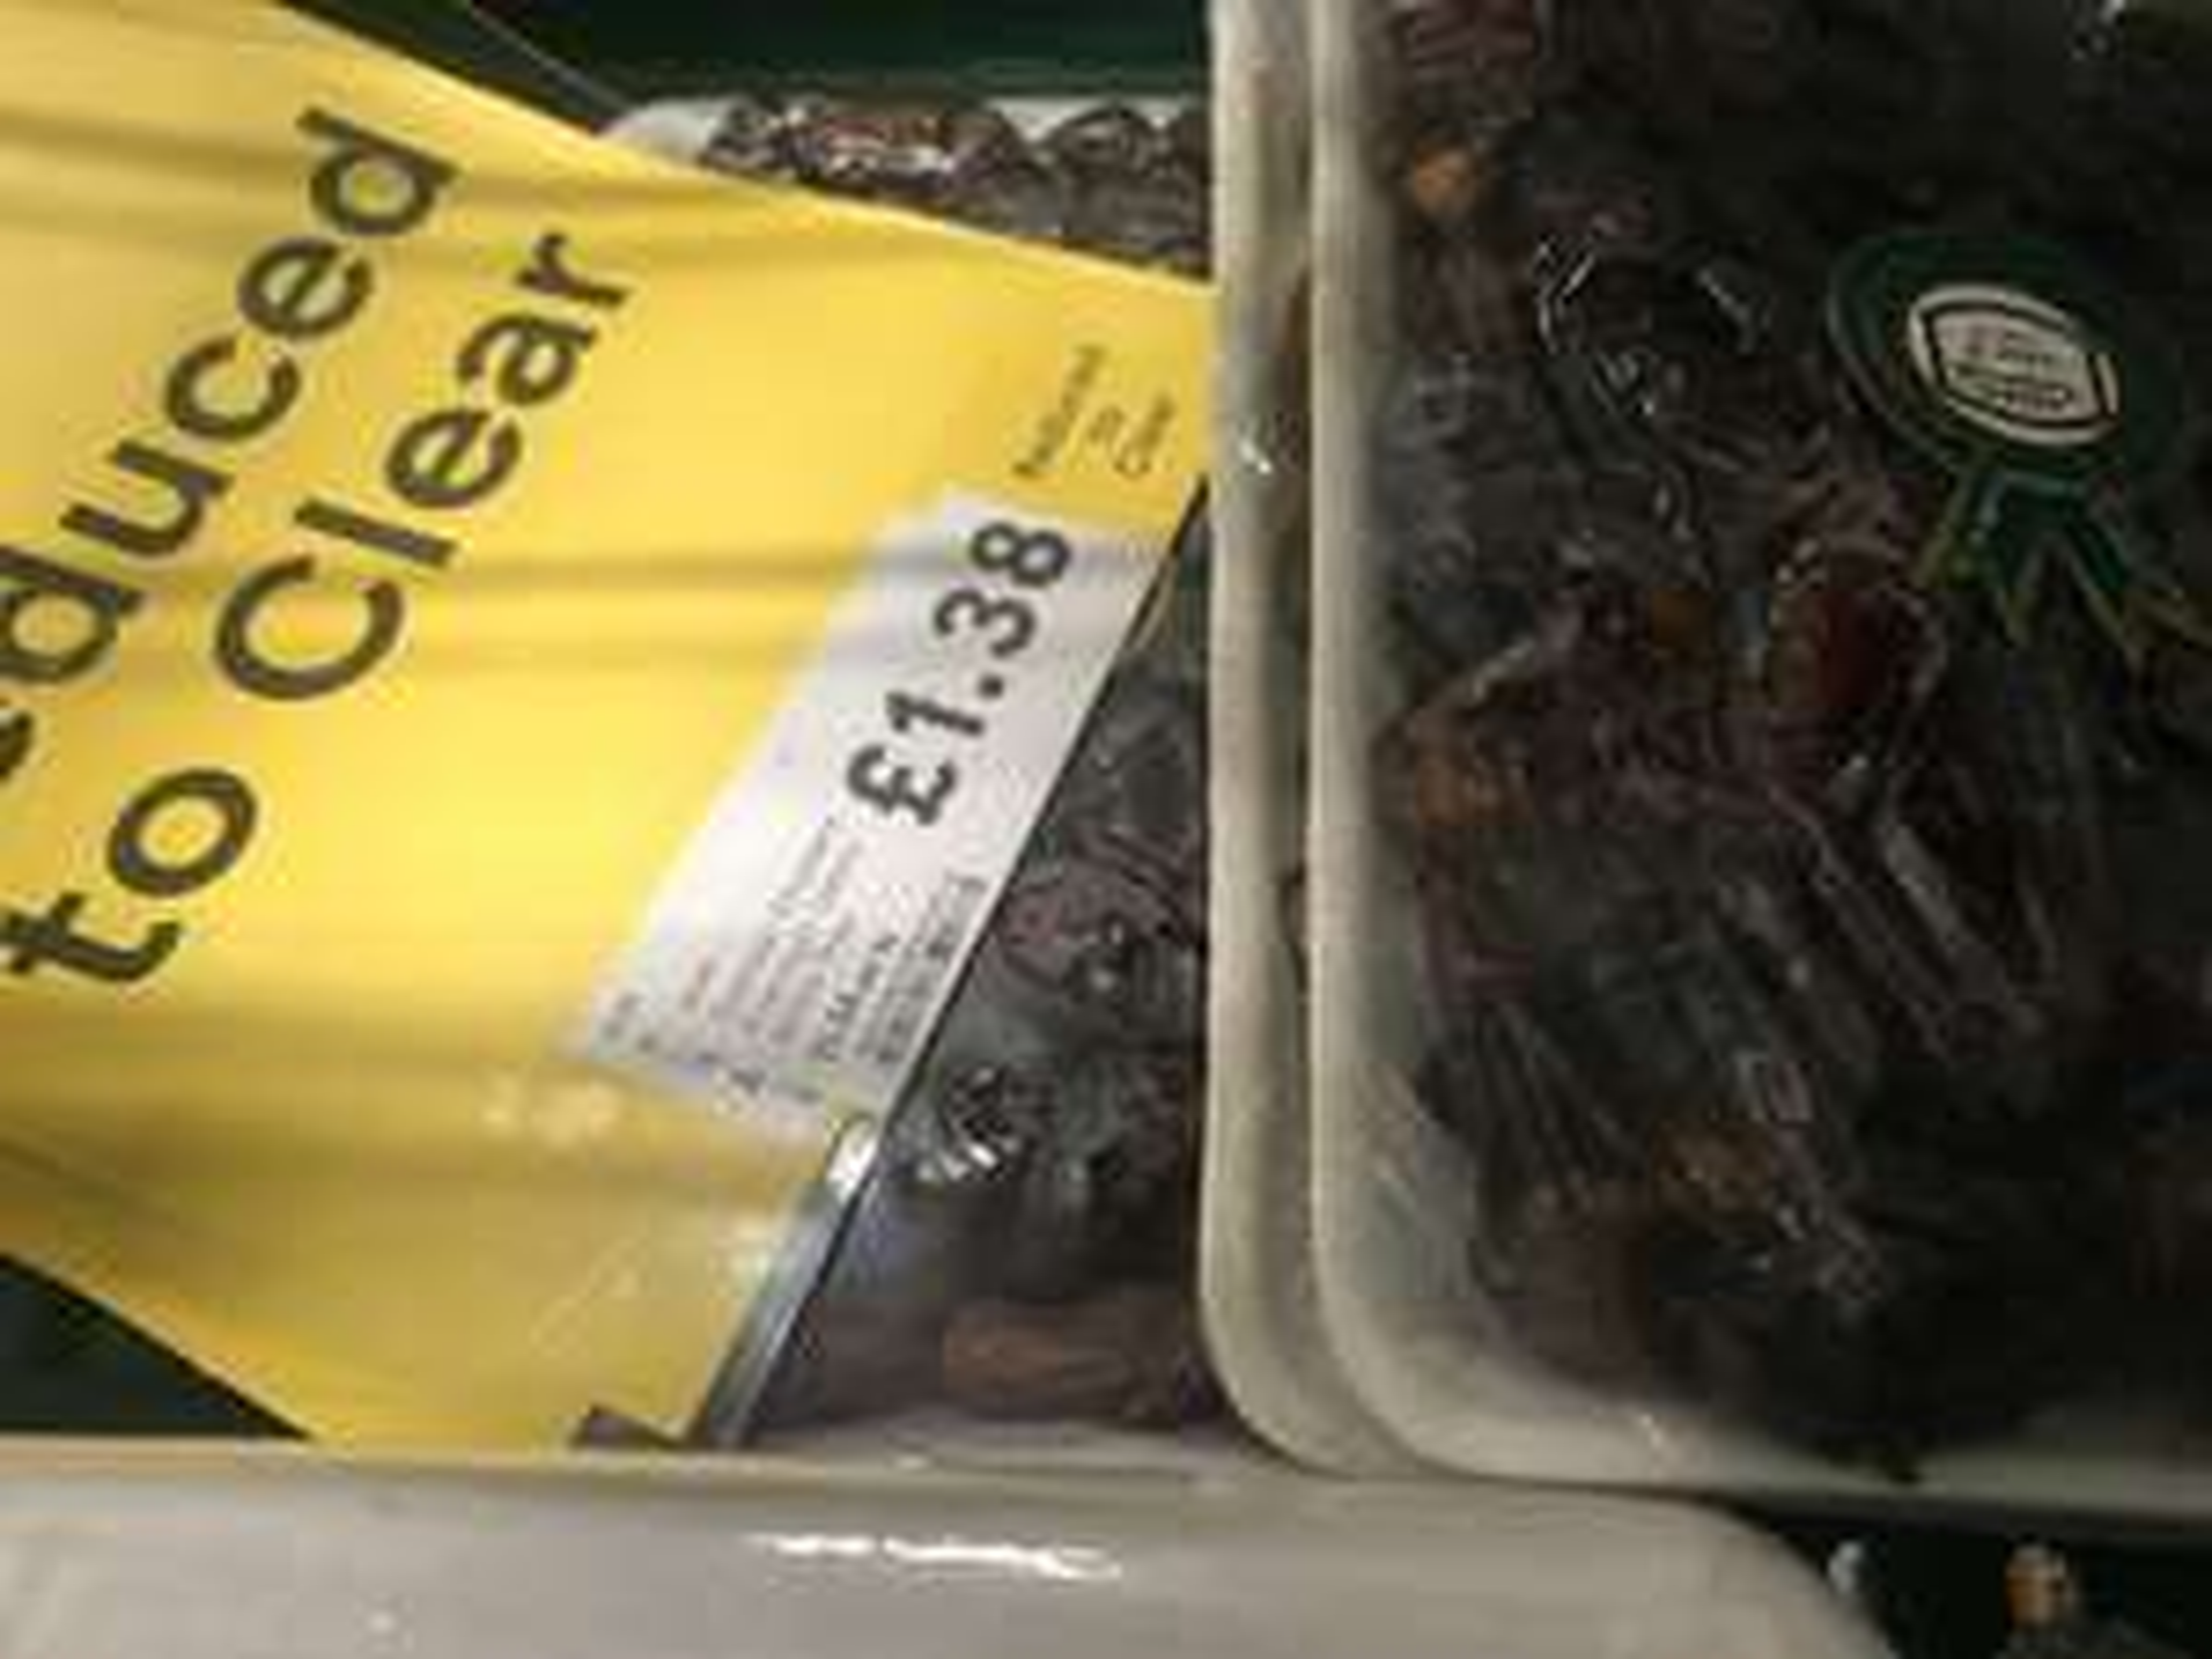 Khudary Dates 900g £1.38 at Tesco instore